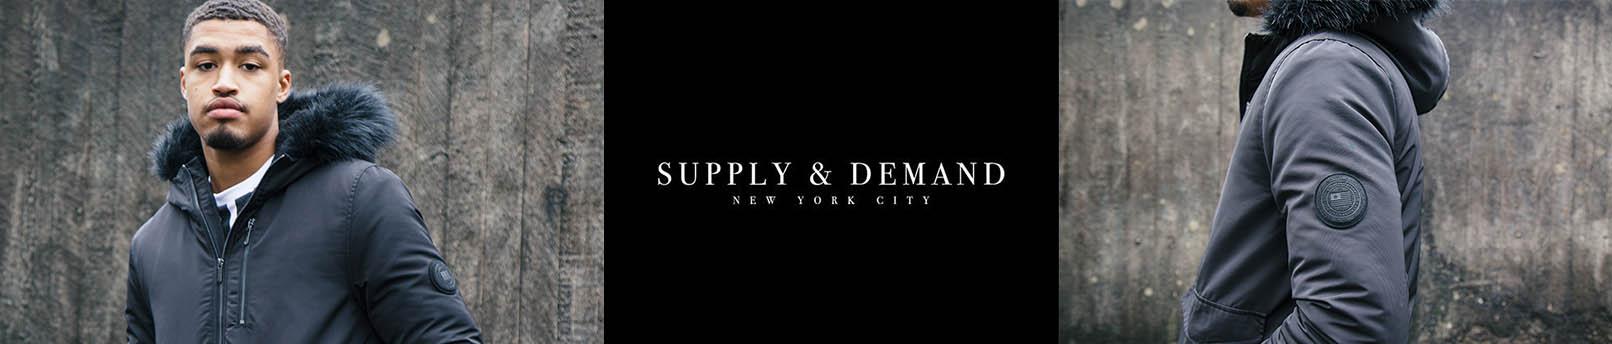 Scopri Supply & Demand